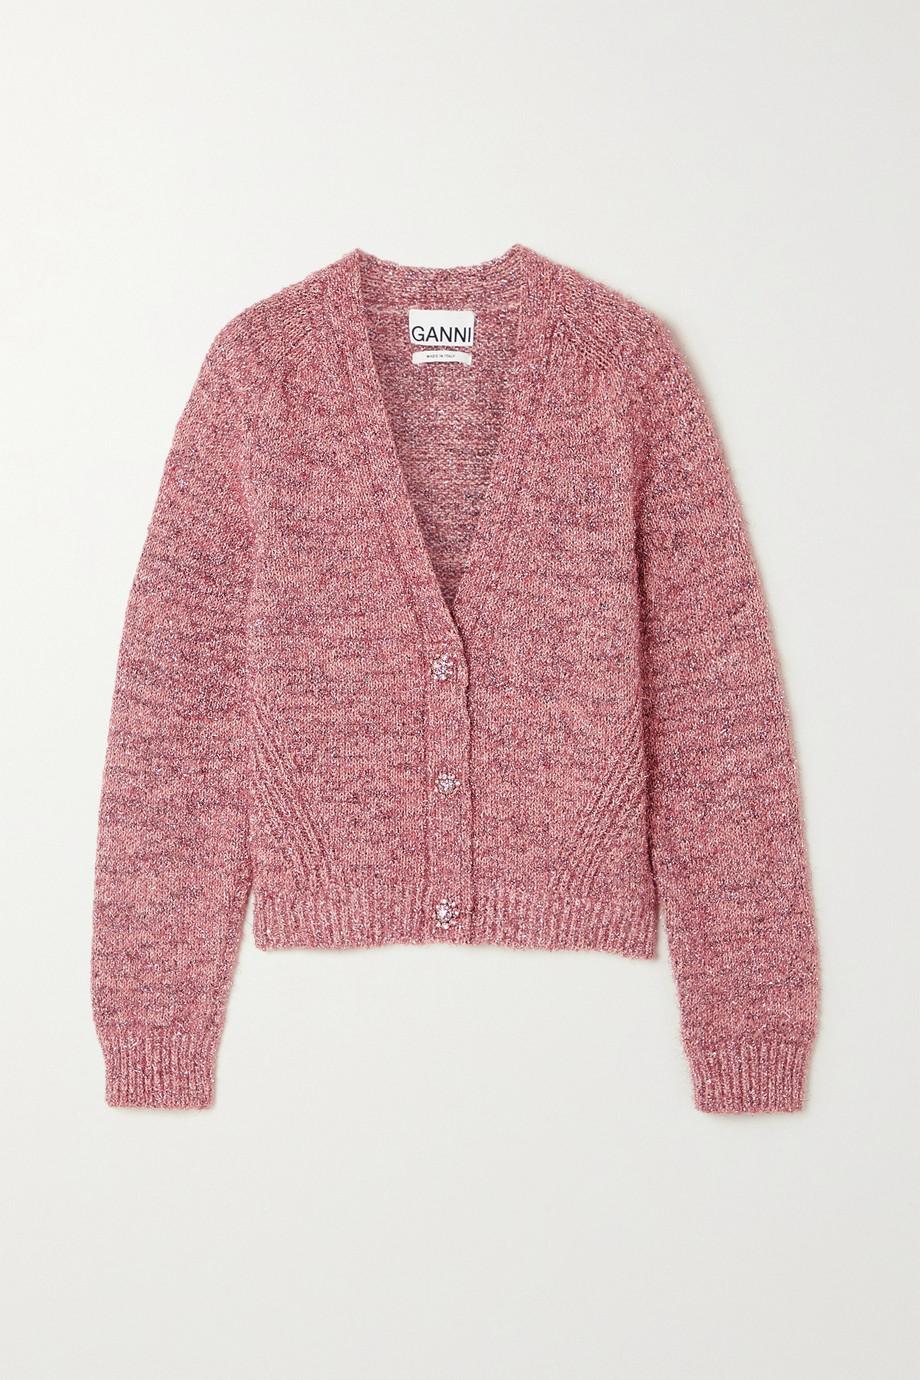 GANNI Crystal-embellished metallic knitted cardigan